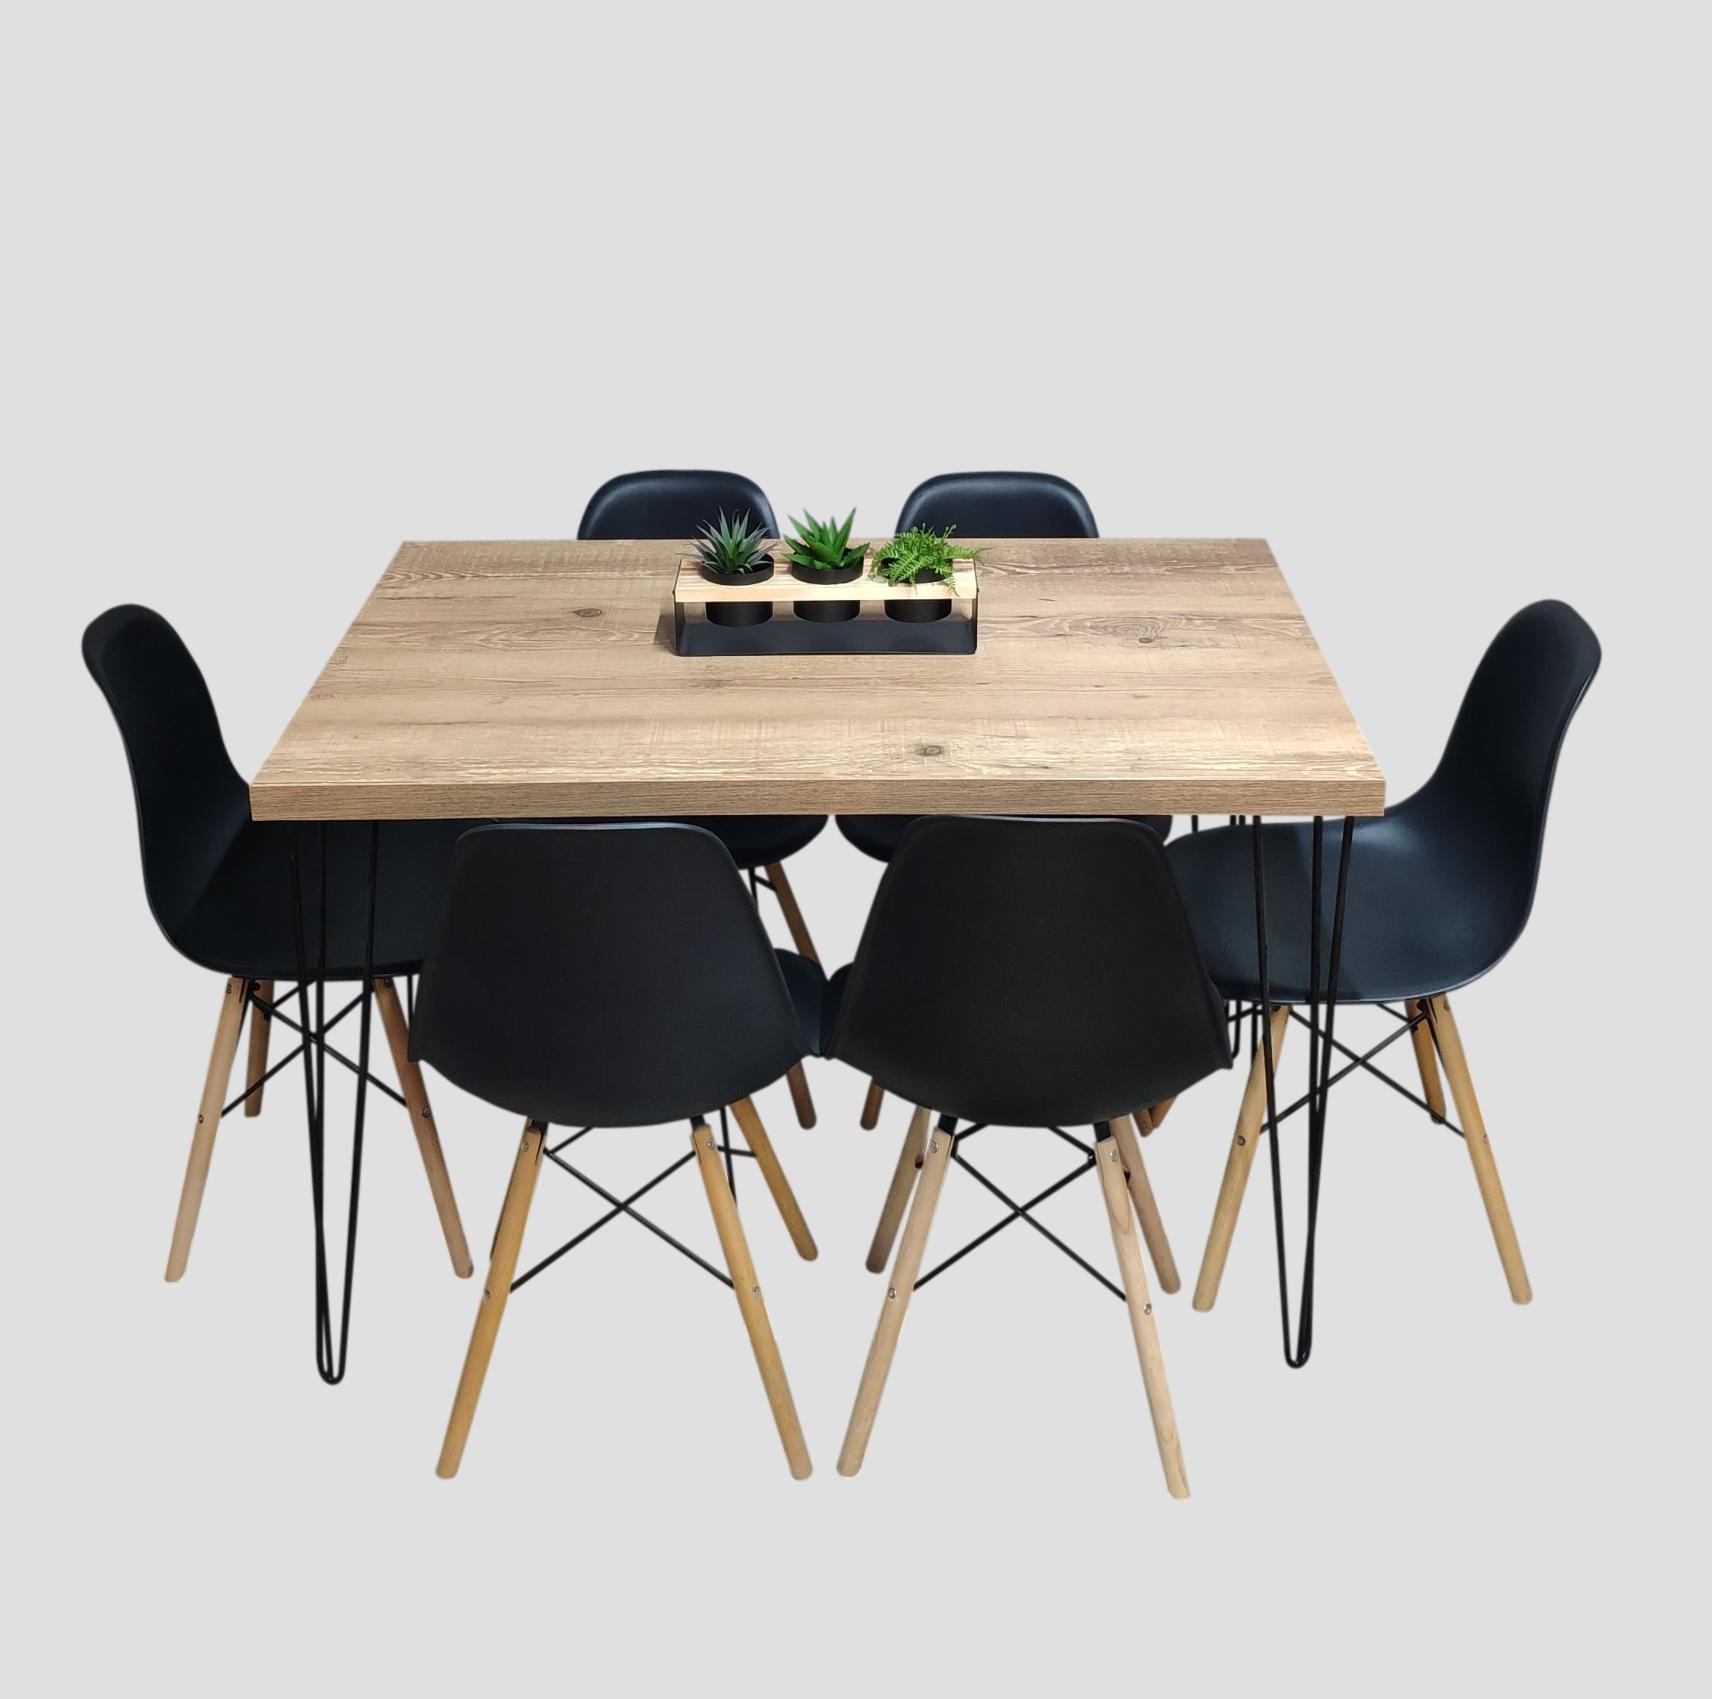 Mesa de Jantar Antiqua 90x150 Hairpin Legs com 6 Cadeiras Eames Pretas  - Mtne Store